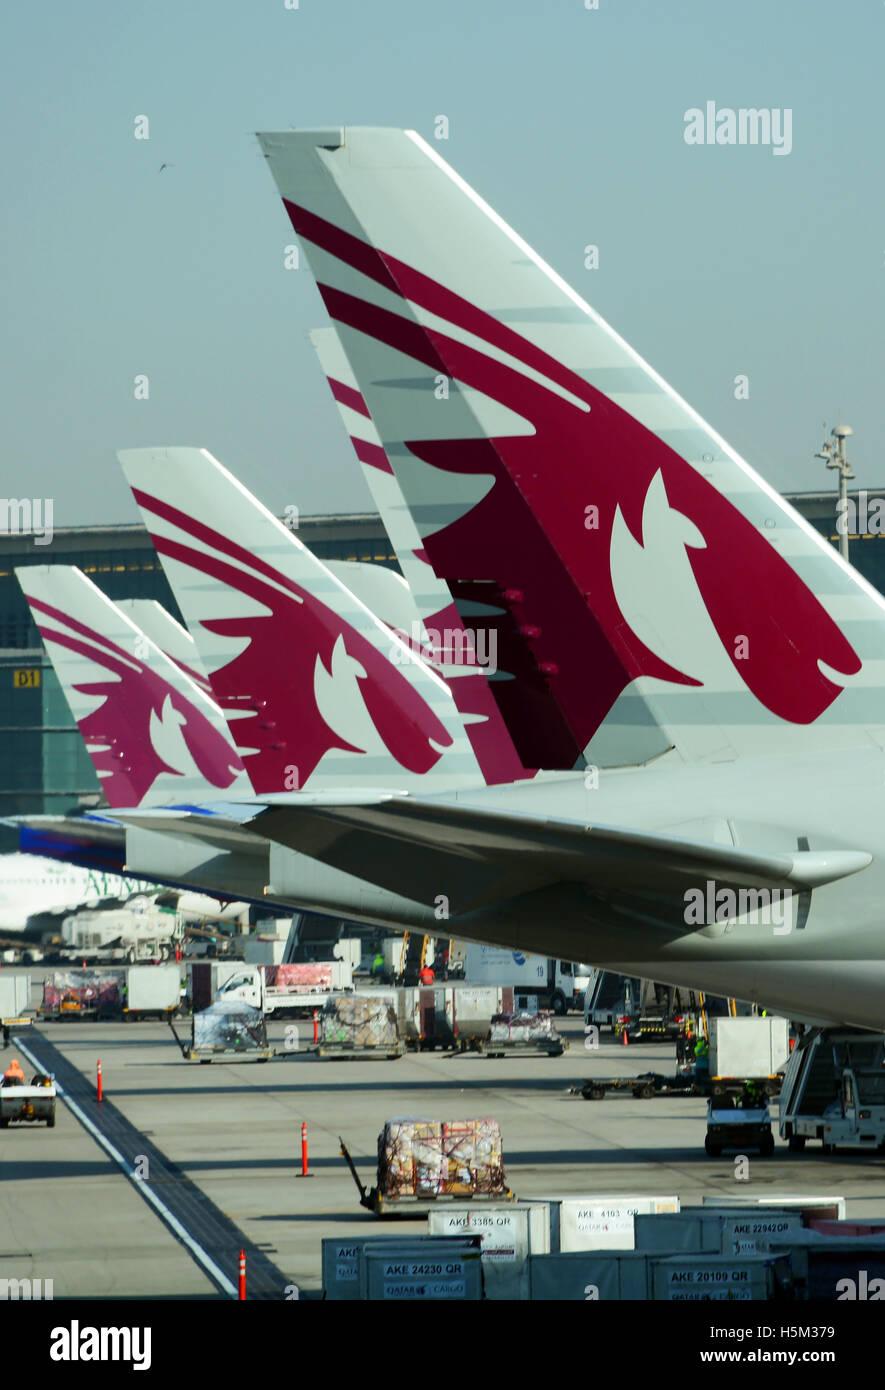 tails of Qatar airplanes Hamad Doha international airport - Stock Image